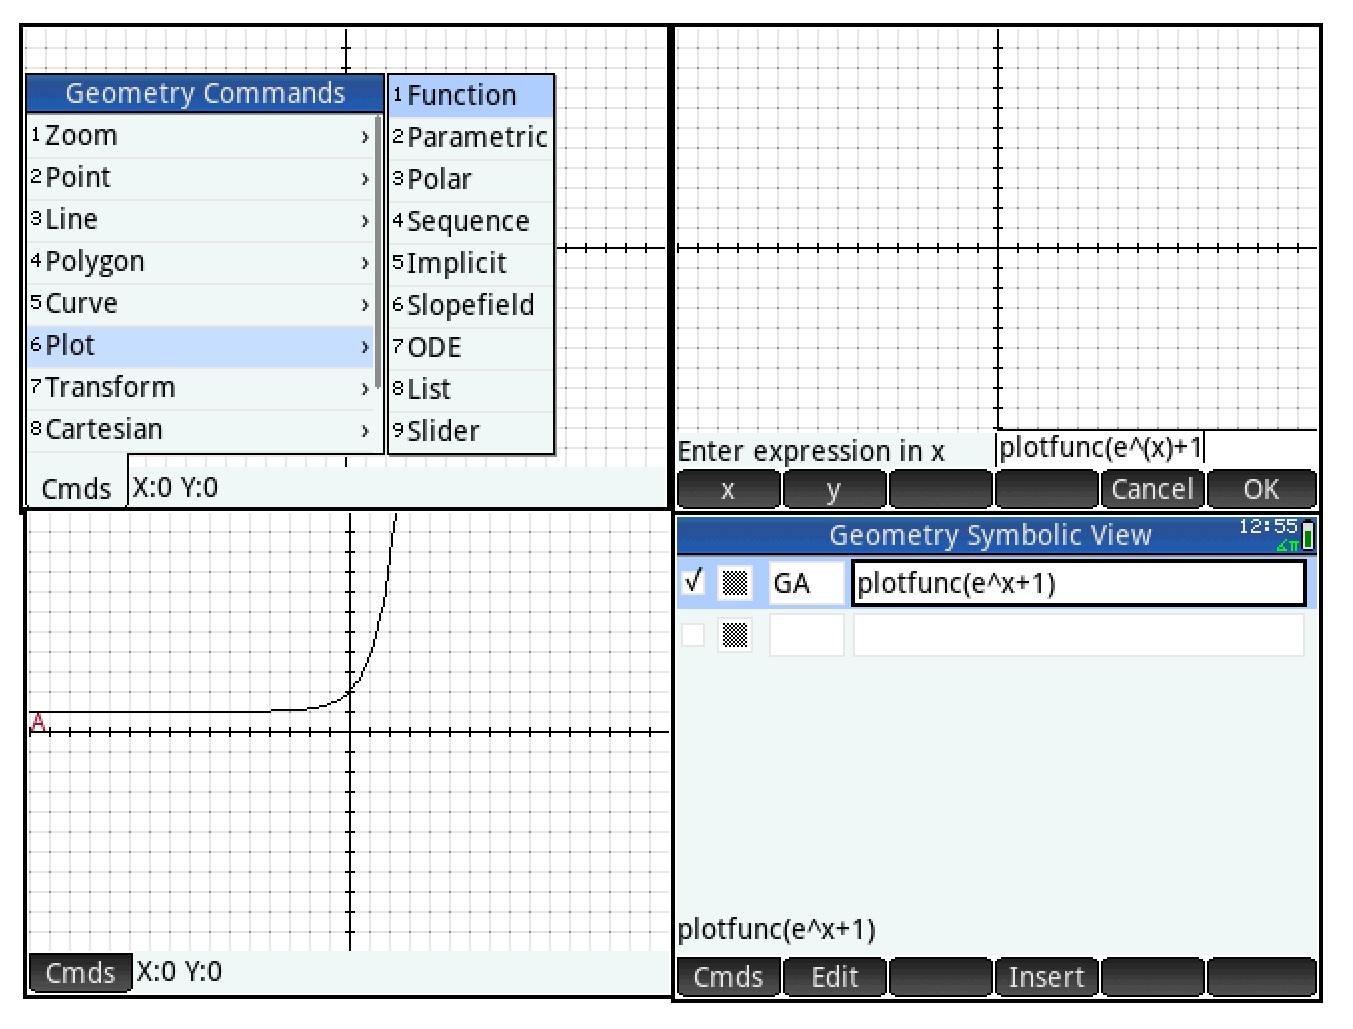 Eddie's Math and Calculator Blog: HP Prime Geometry App